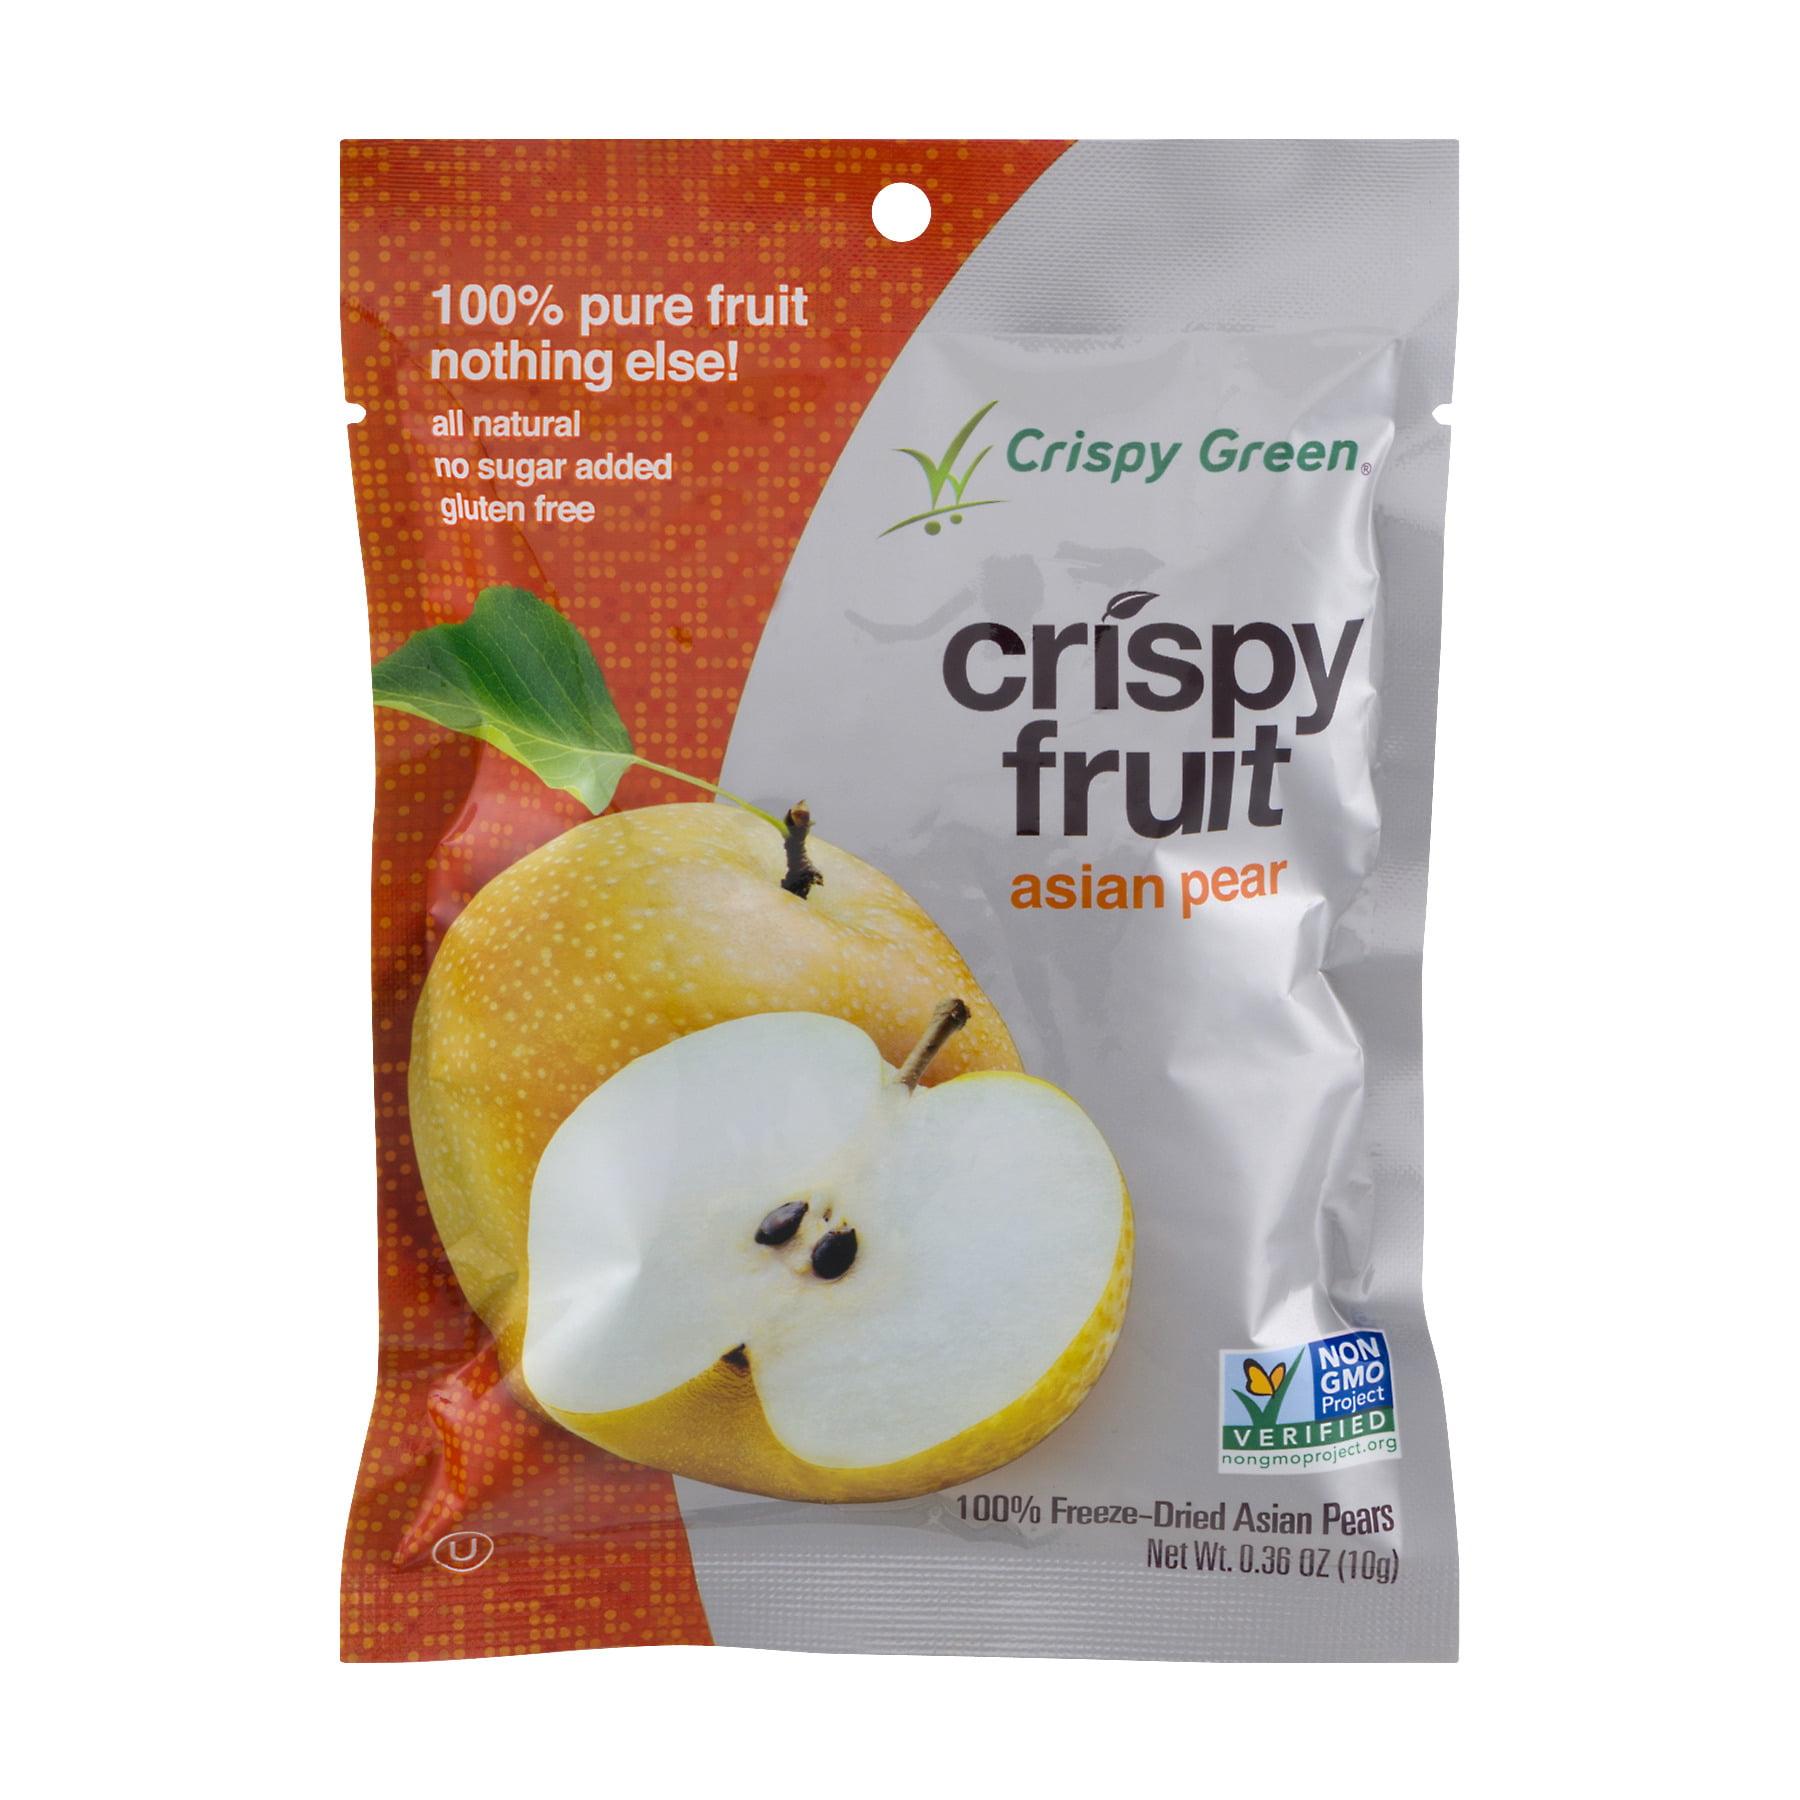 Crispy Green Crispy Fruit Freeze-Dried Asian Pear, 0.36 OZ by Crispy Green, Inc.